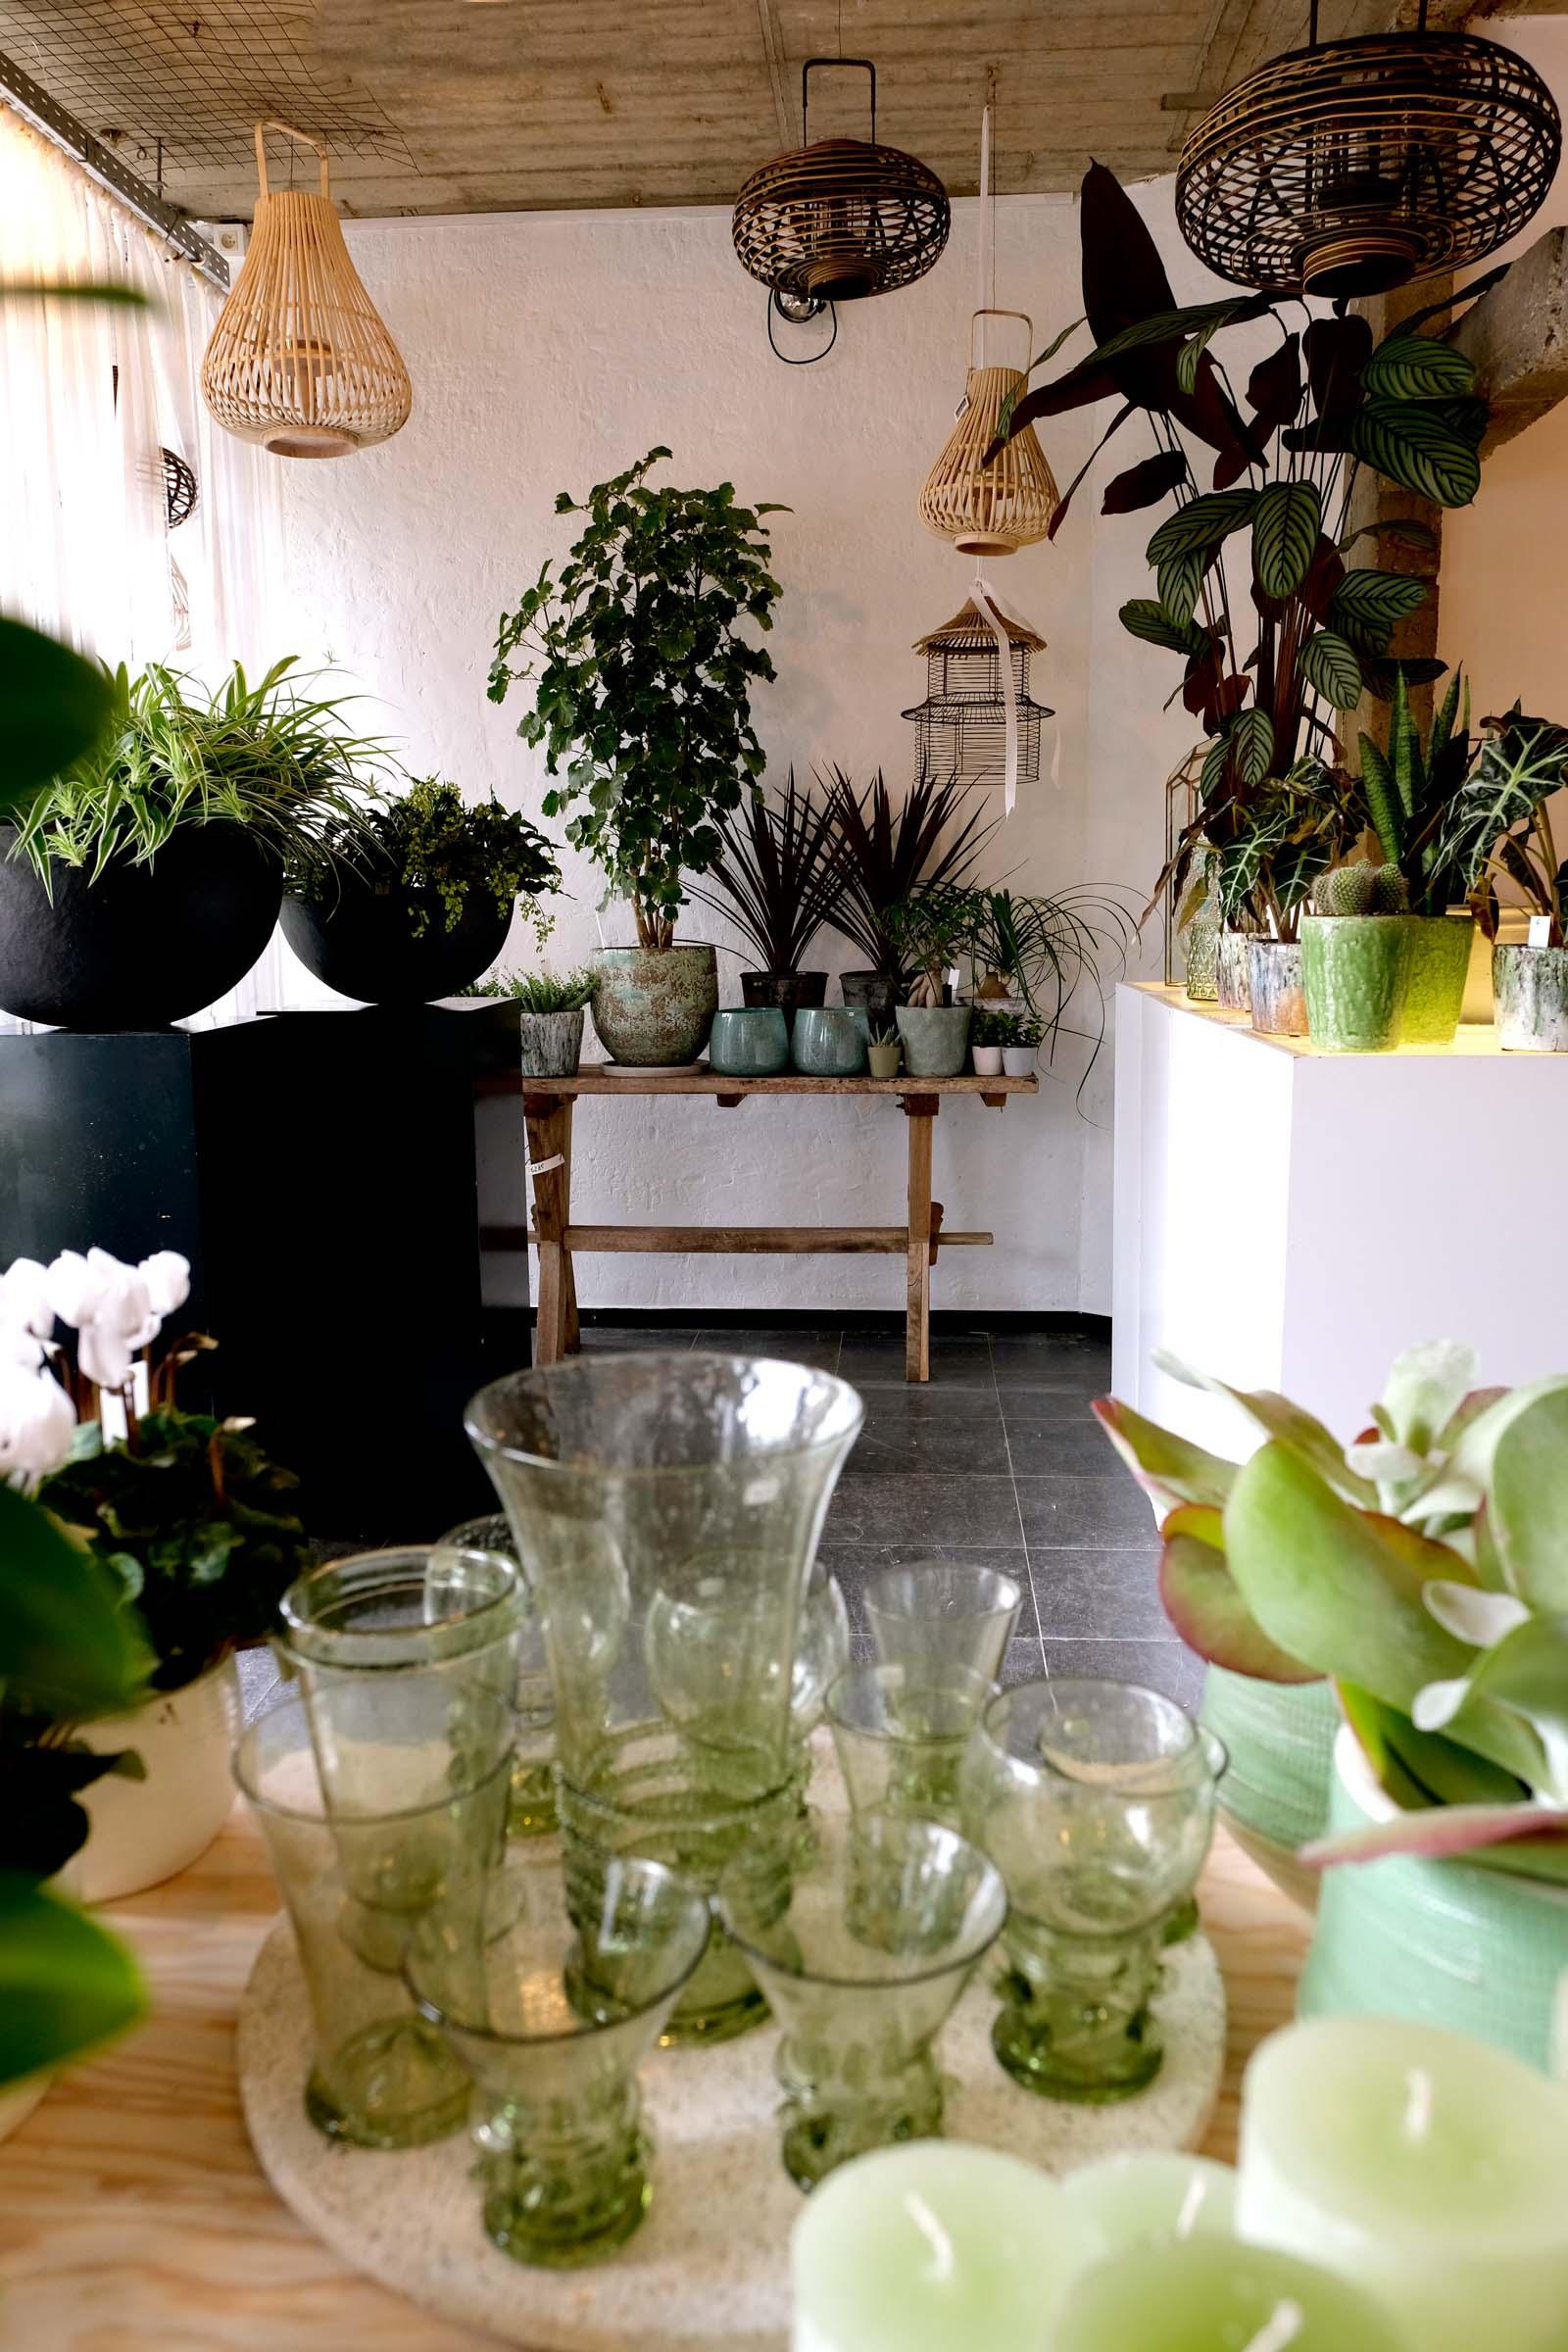 Urban jungle store - Degrootebloemen.be